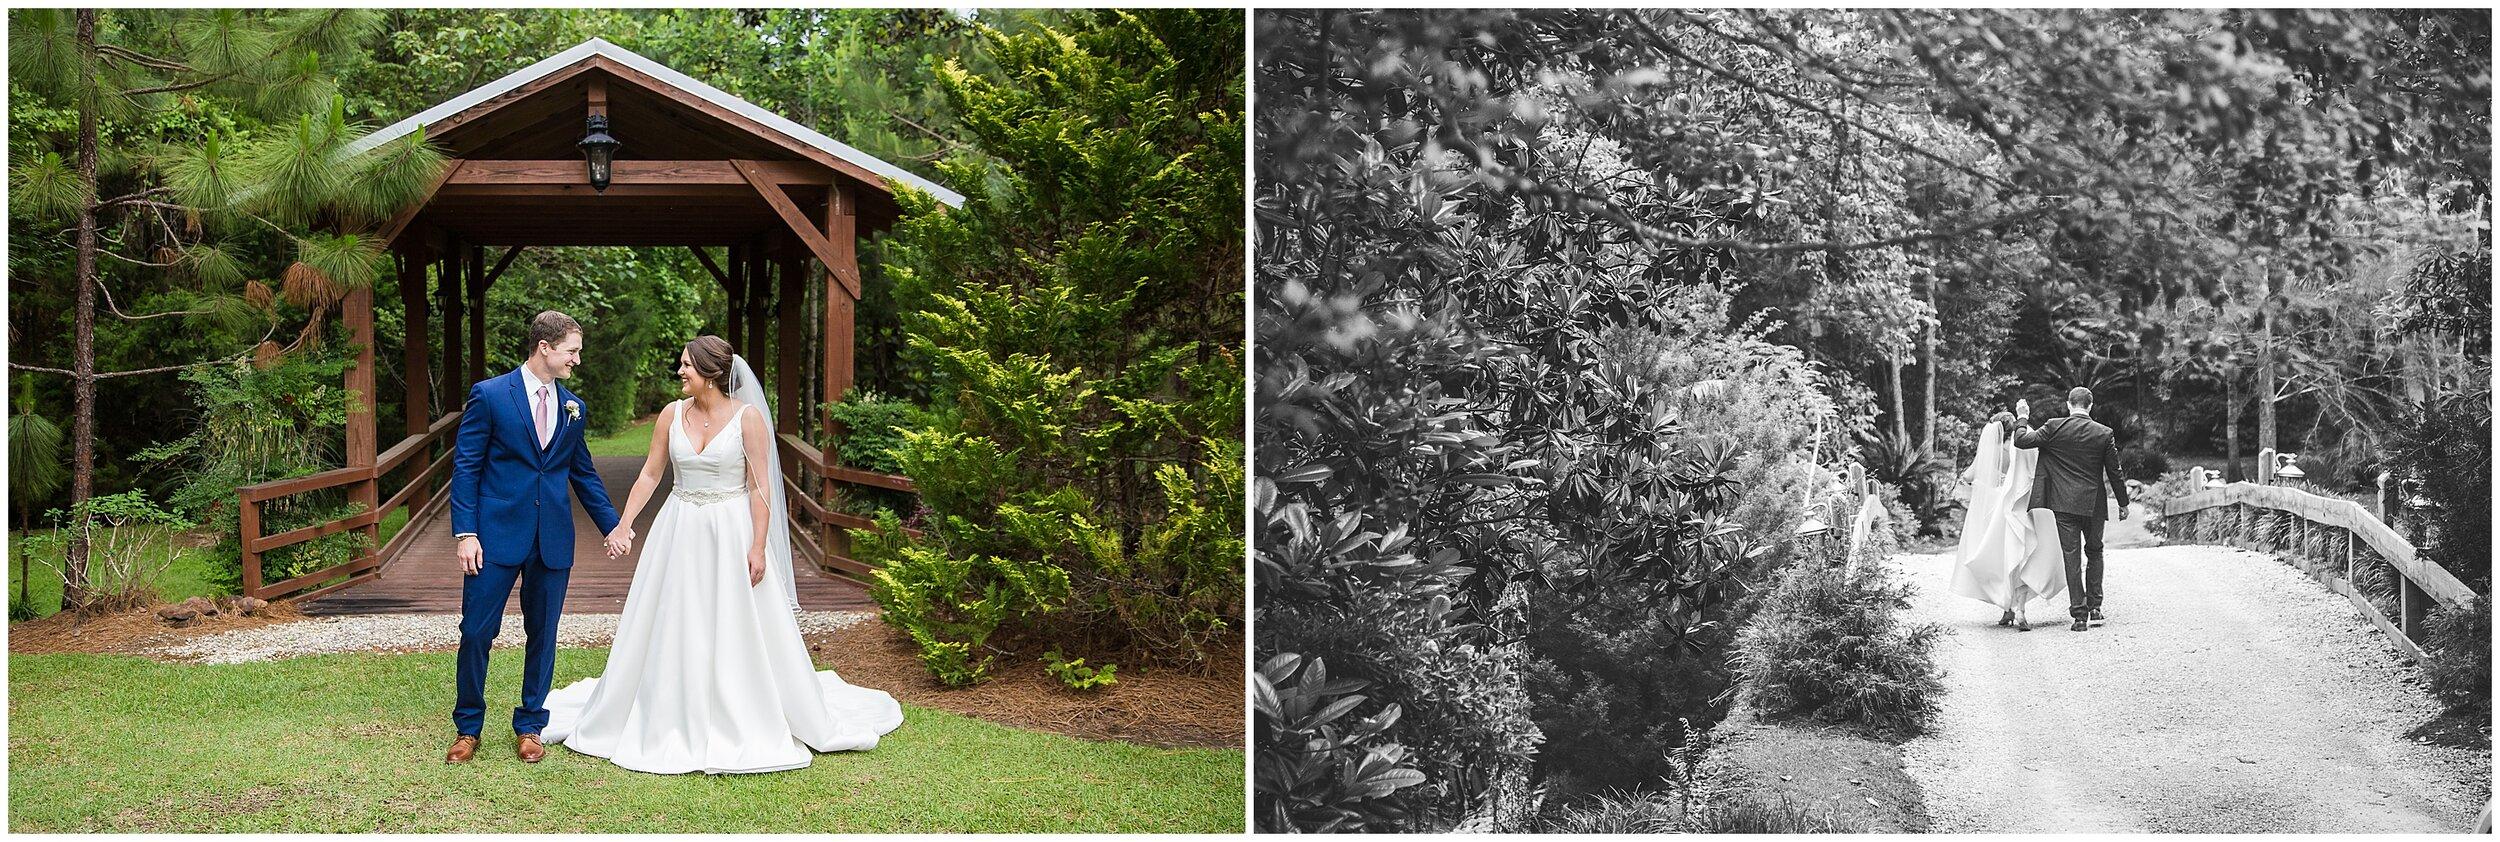 Bella Sera Gardens Alabama Wedding Photographer Videography Briana Zac_0016.jpg